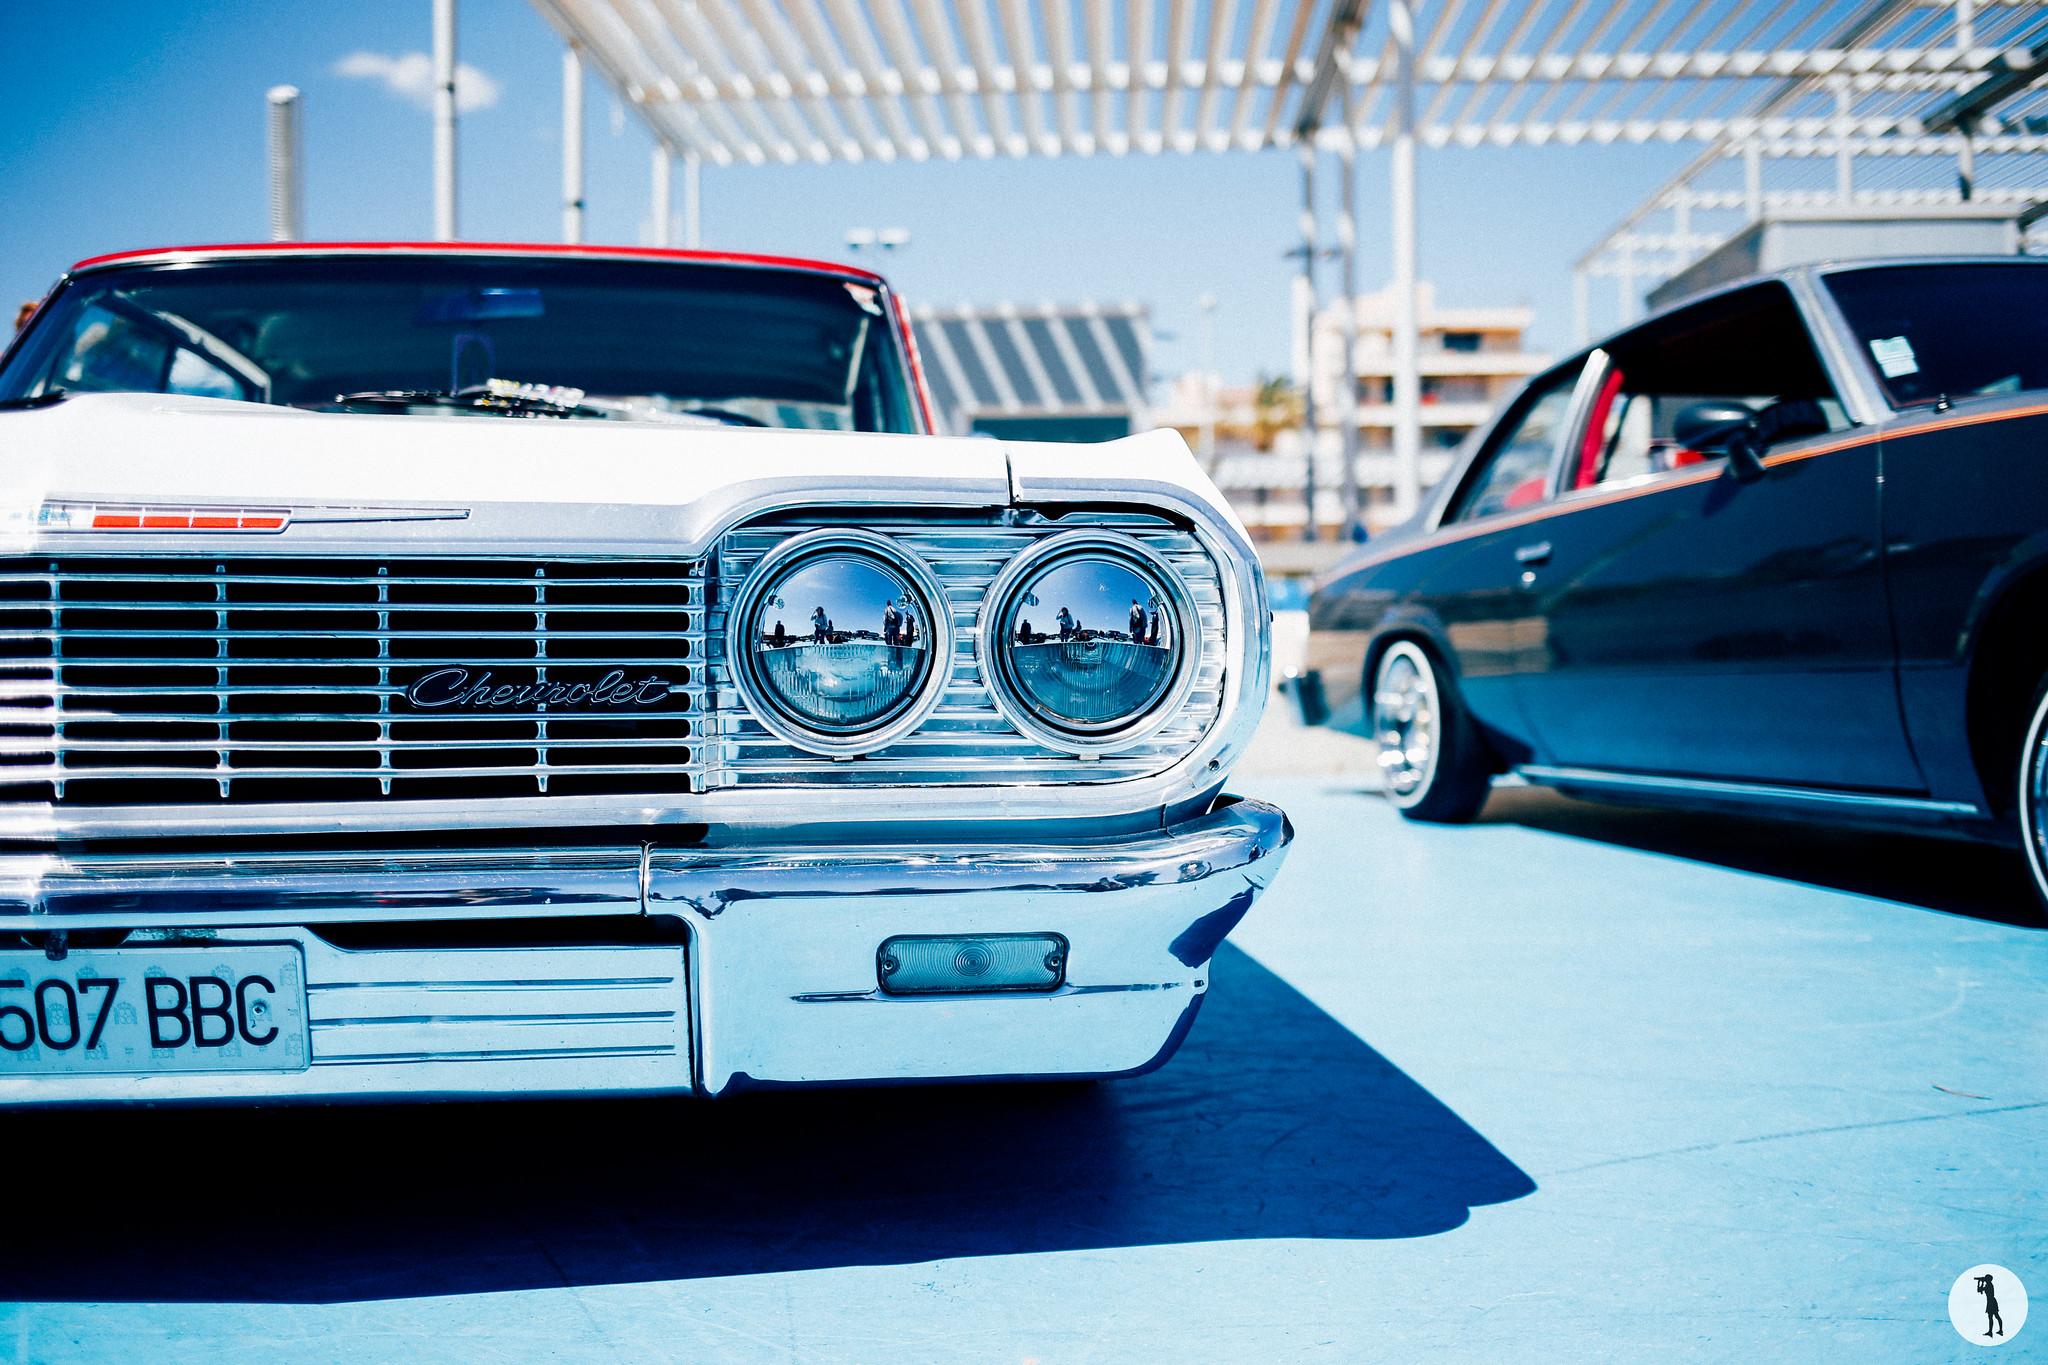 Riverside Car Show 2016, Calafell, Spain